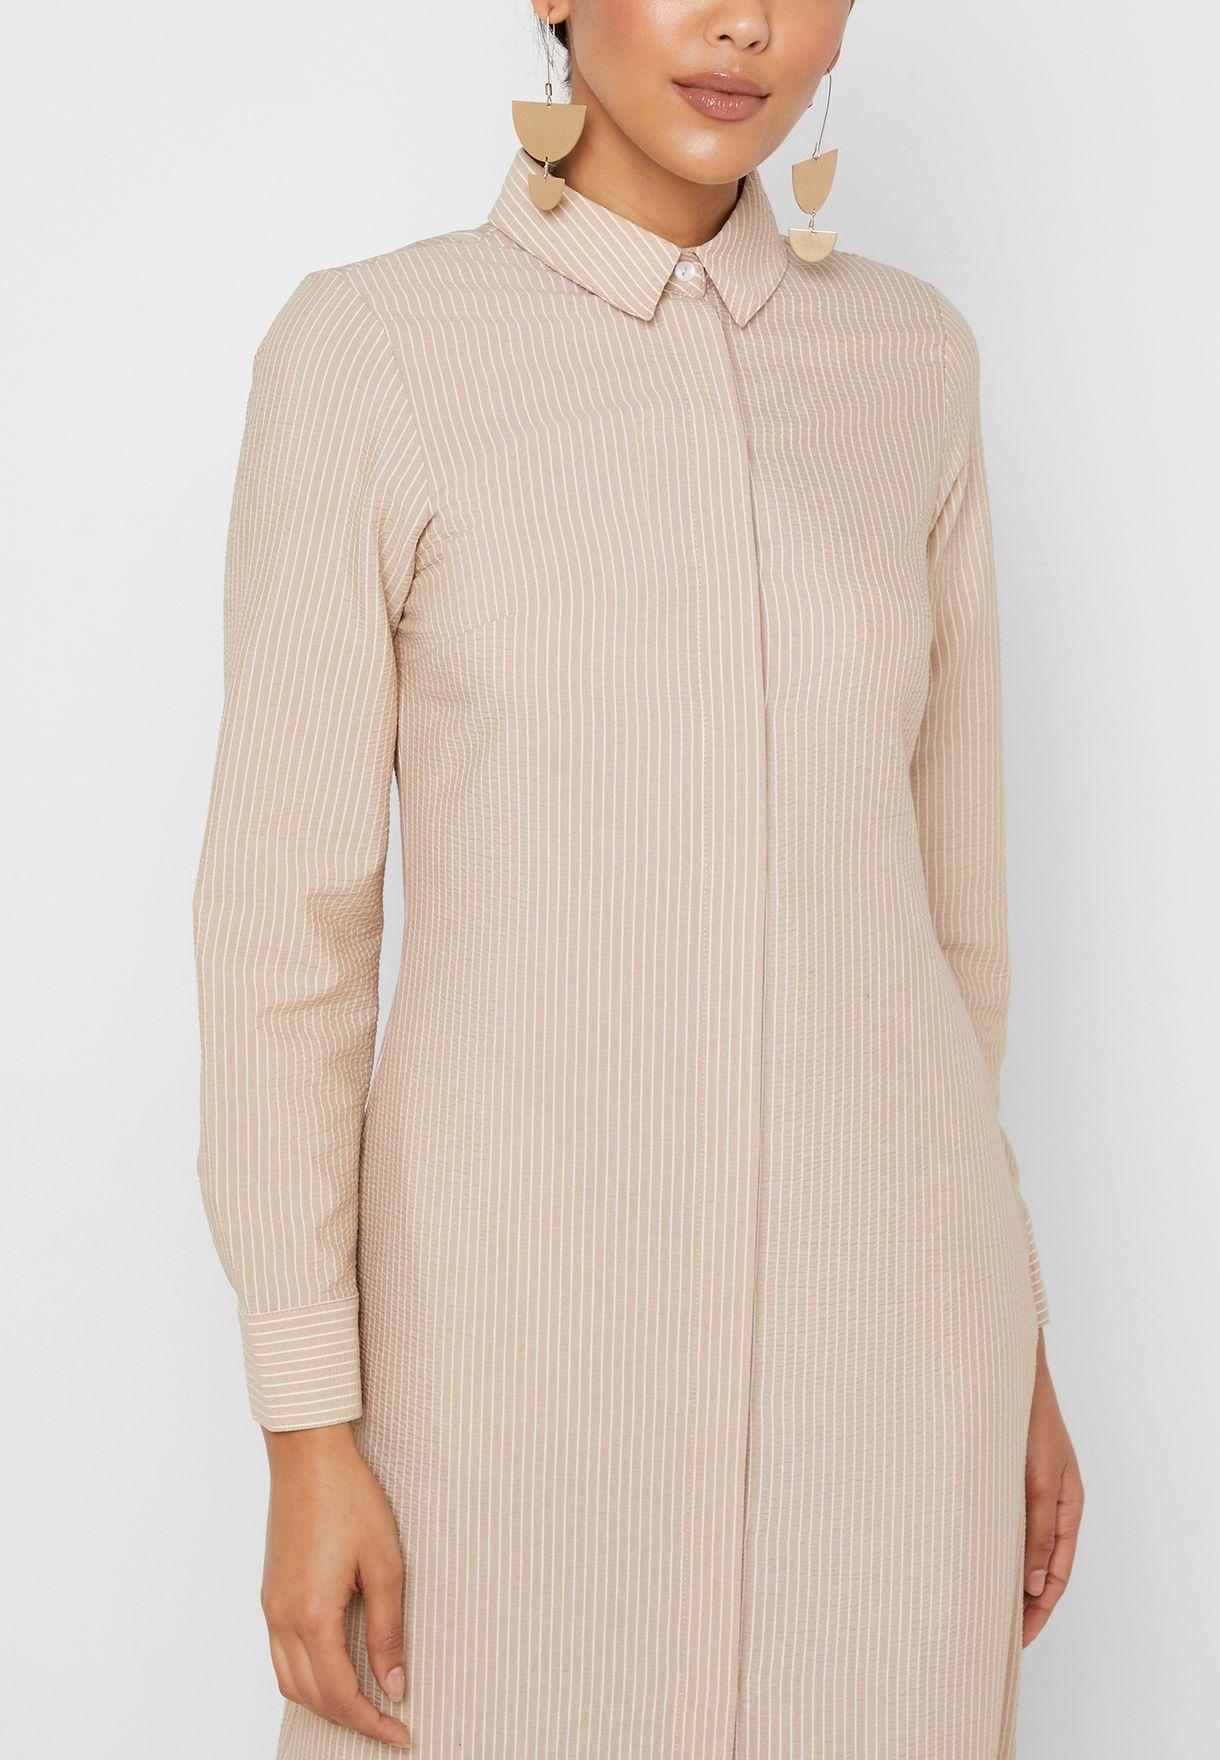 Layered Ruffle Hem Button Down Dress